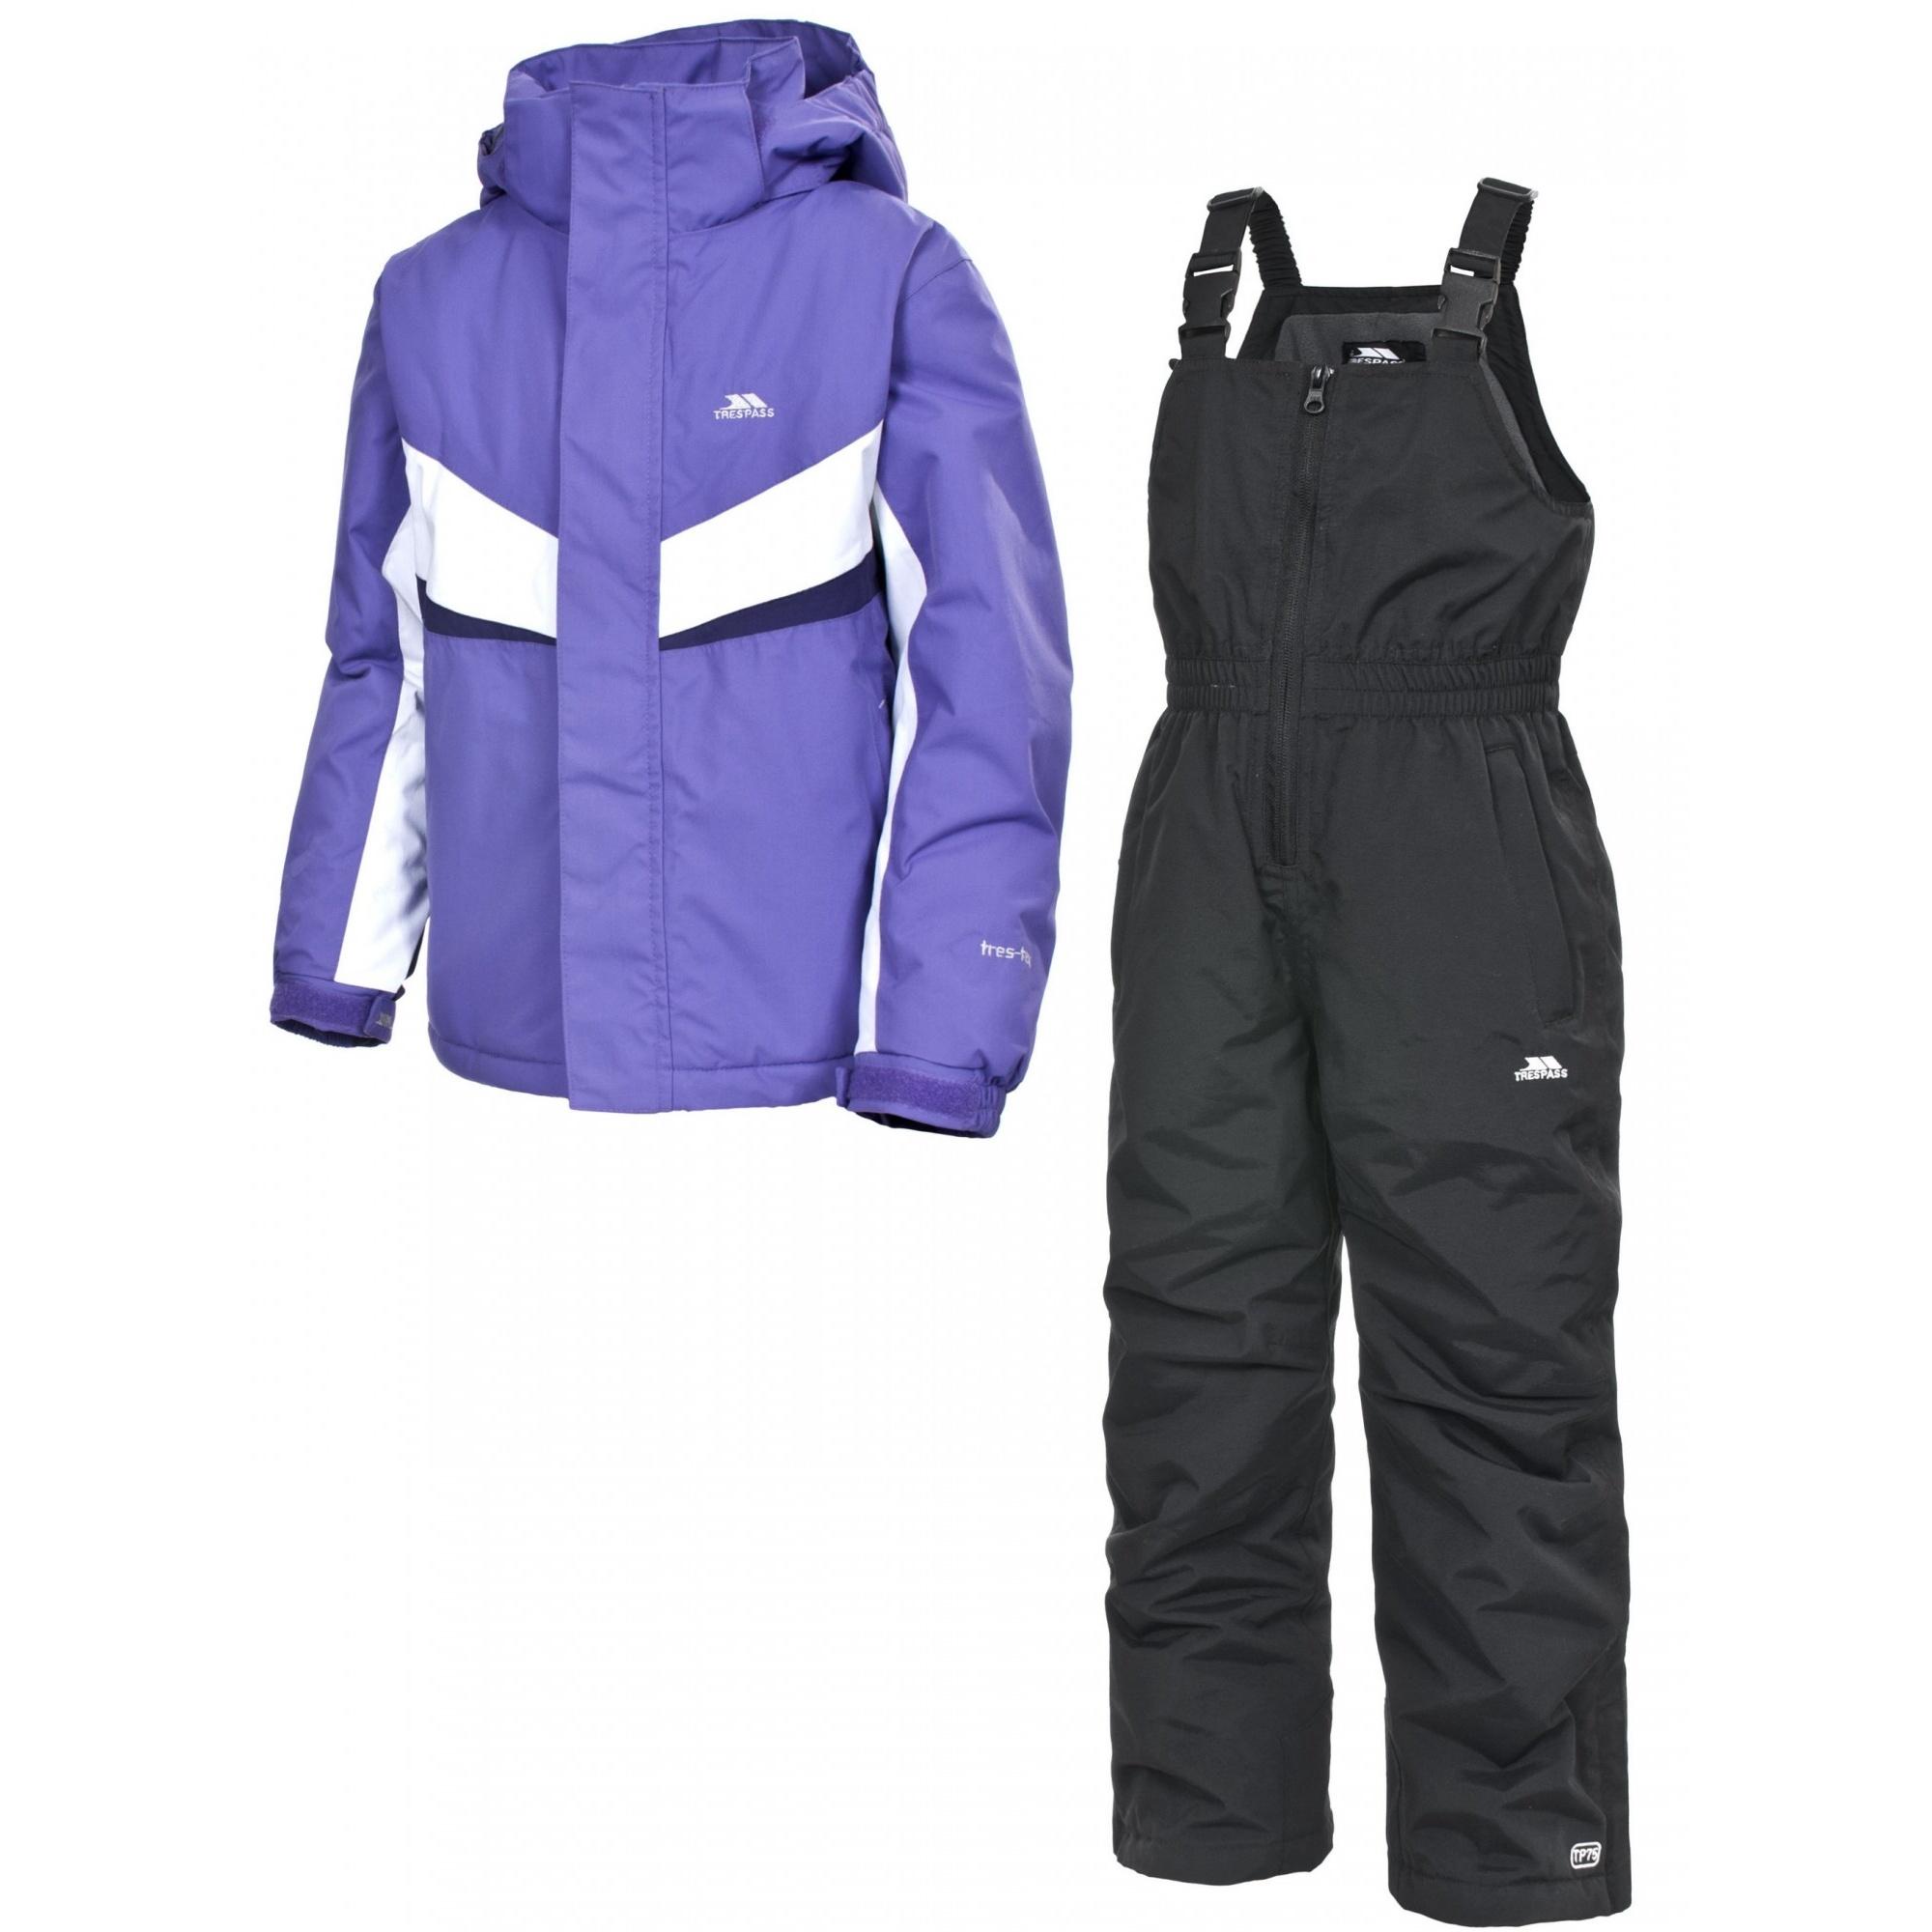 trespass chamonix ensemble veste et salopette de ski enfant unisexe ebay. Black Bedroom Furniture Sets. Home Design Ideas